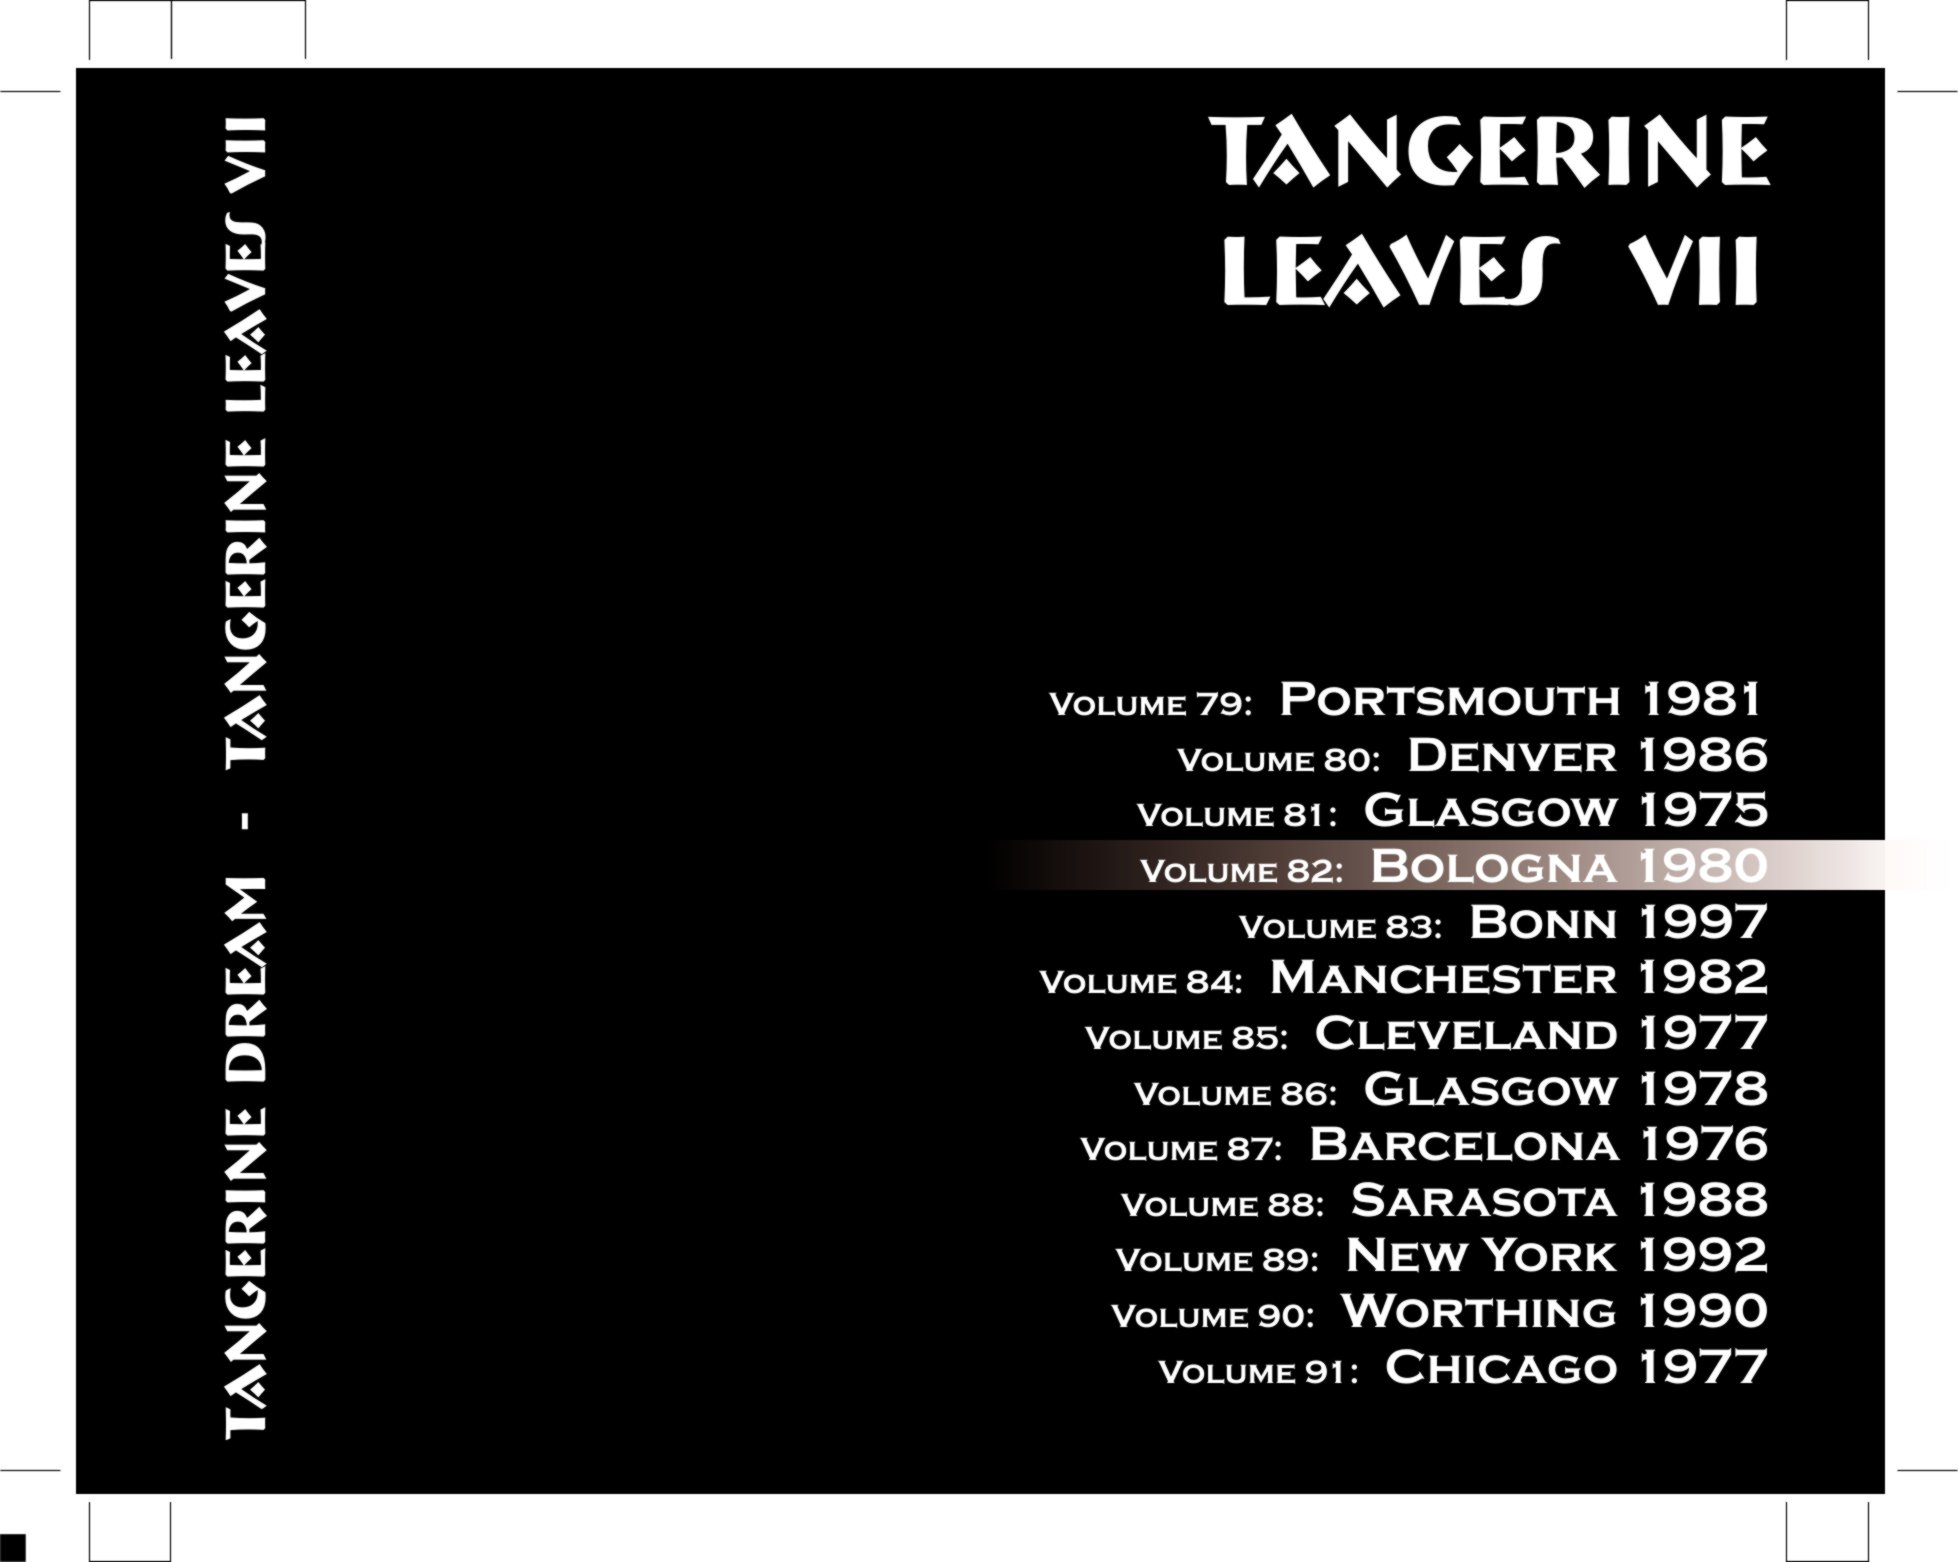 TangerineDream1980-10-20PalasportBolognaItaly.jpg